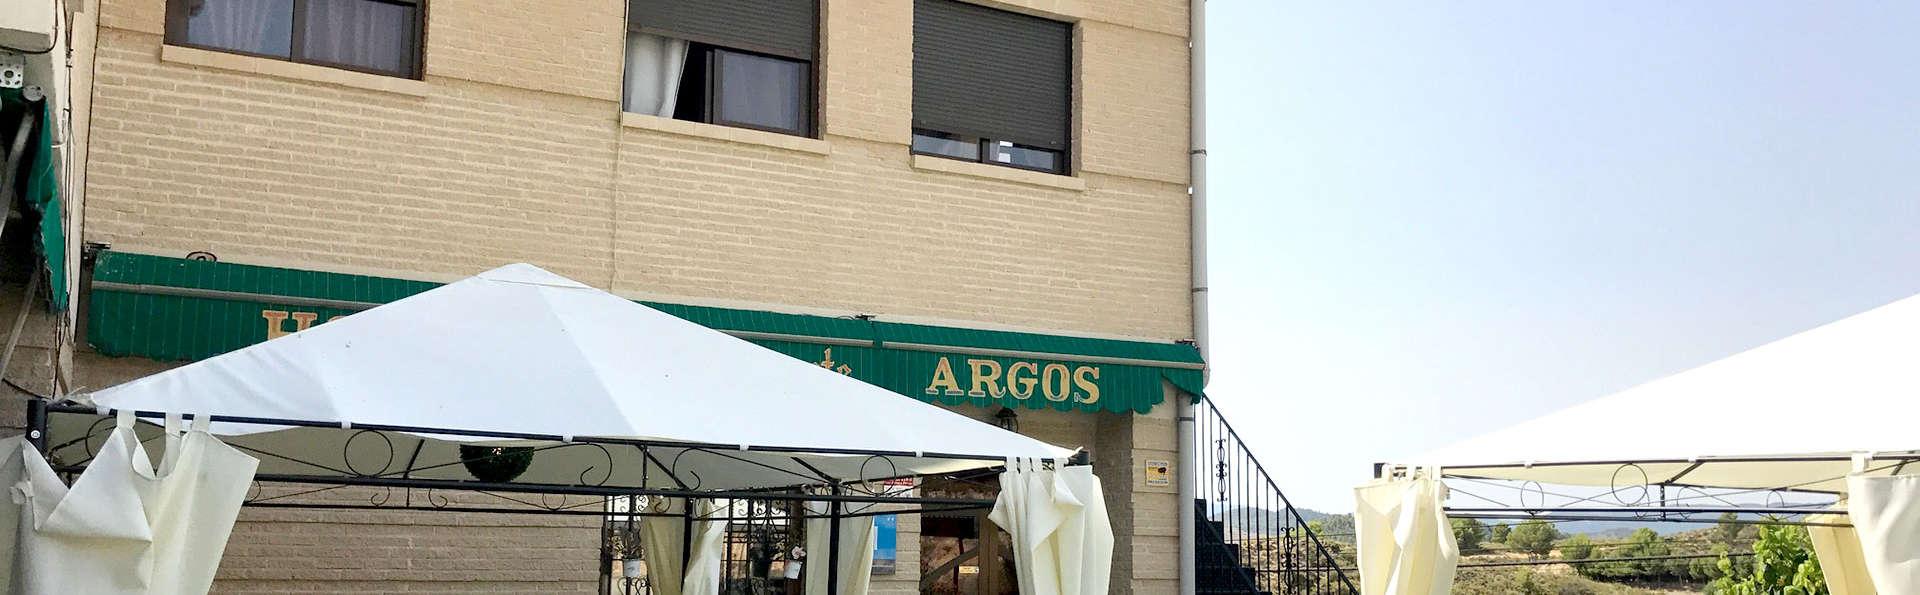 Hotel Argos Murcia - EDIT_NEW2_FRONT.jpg